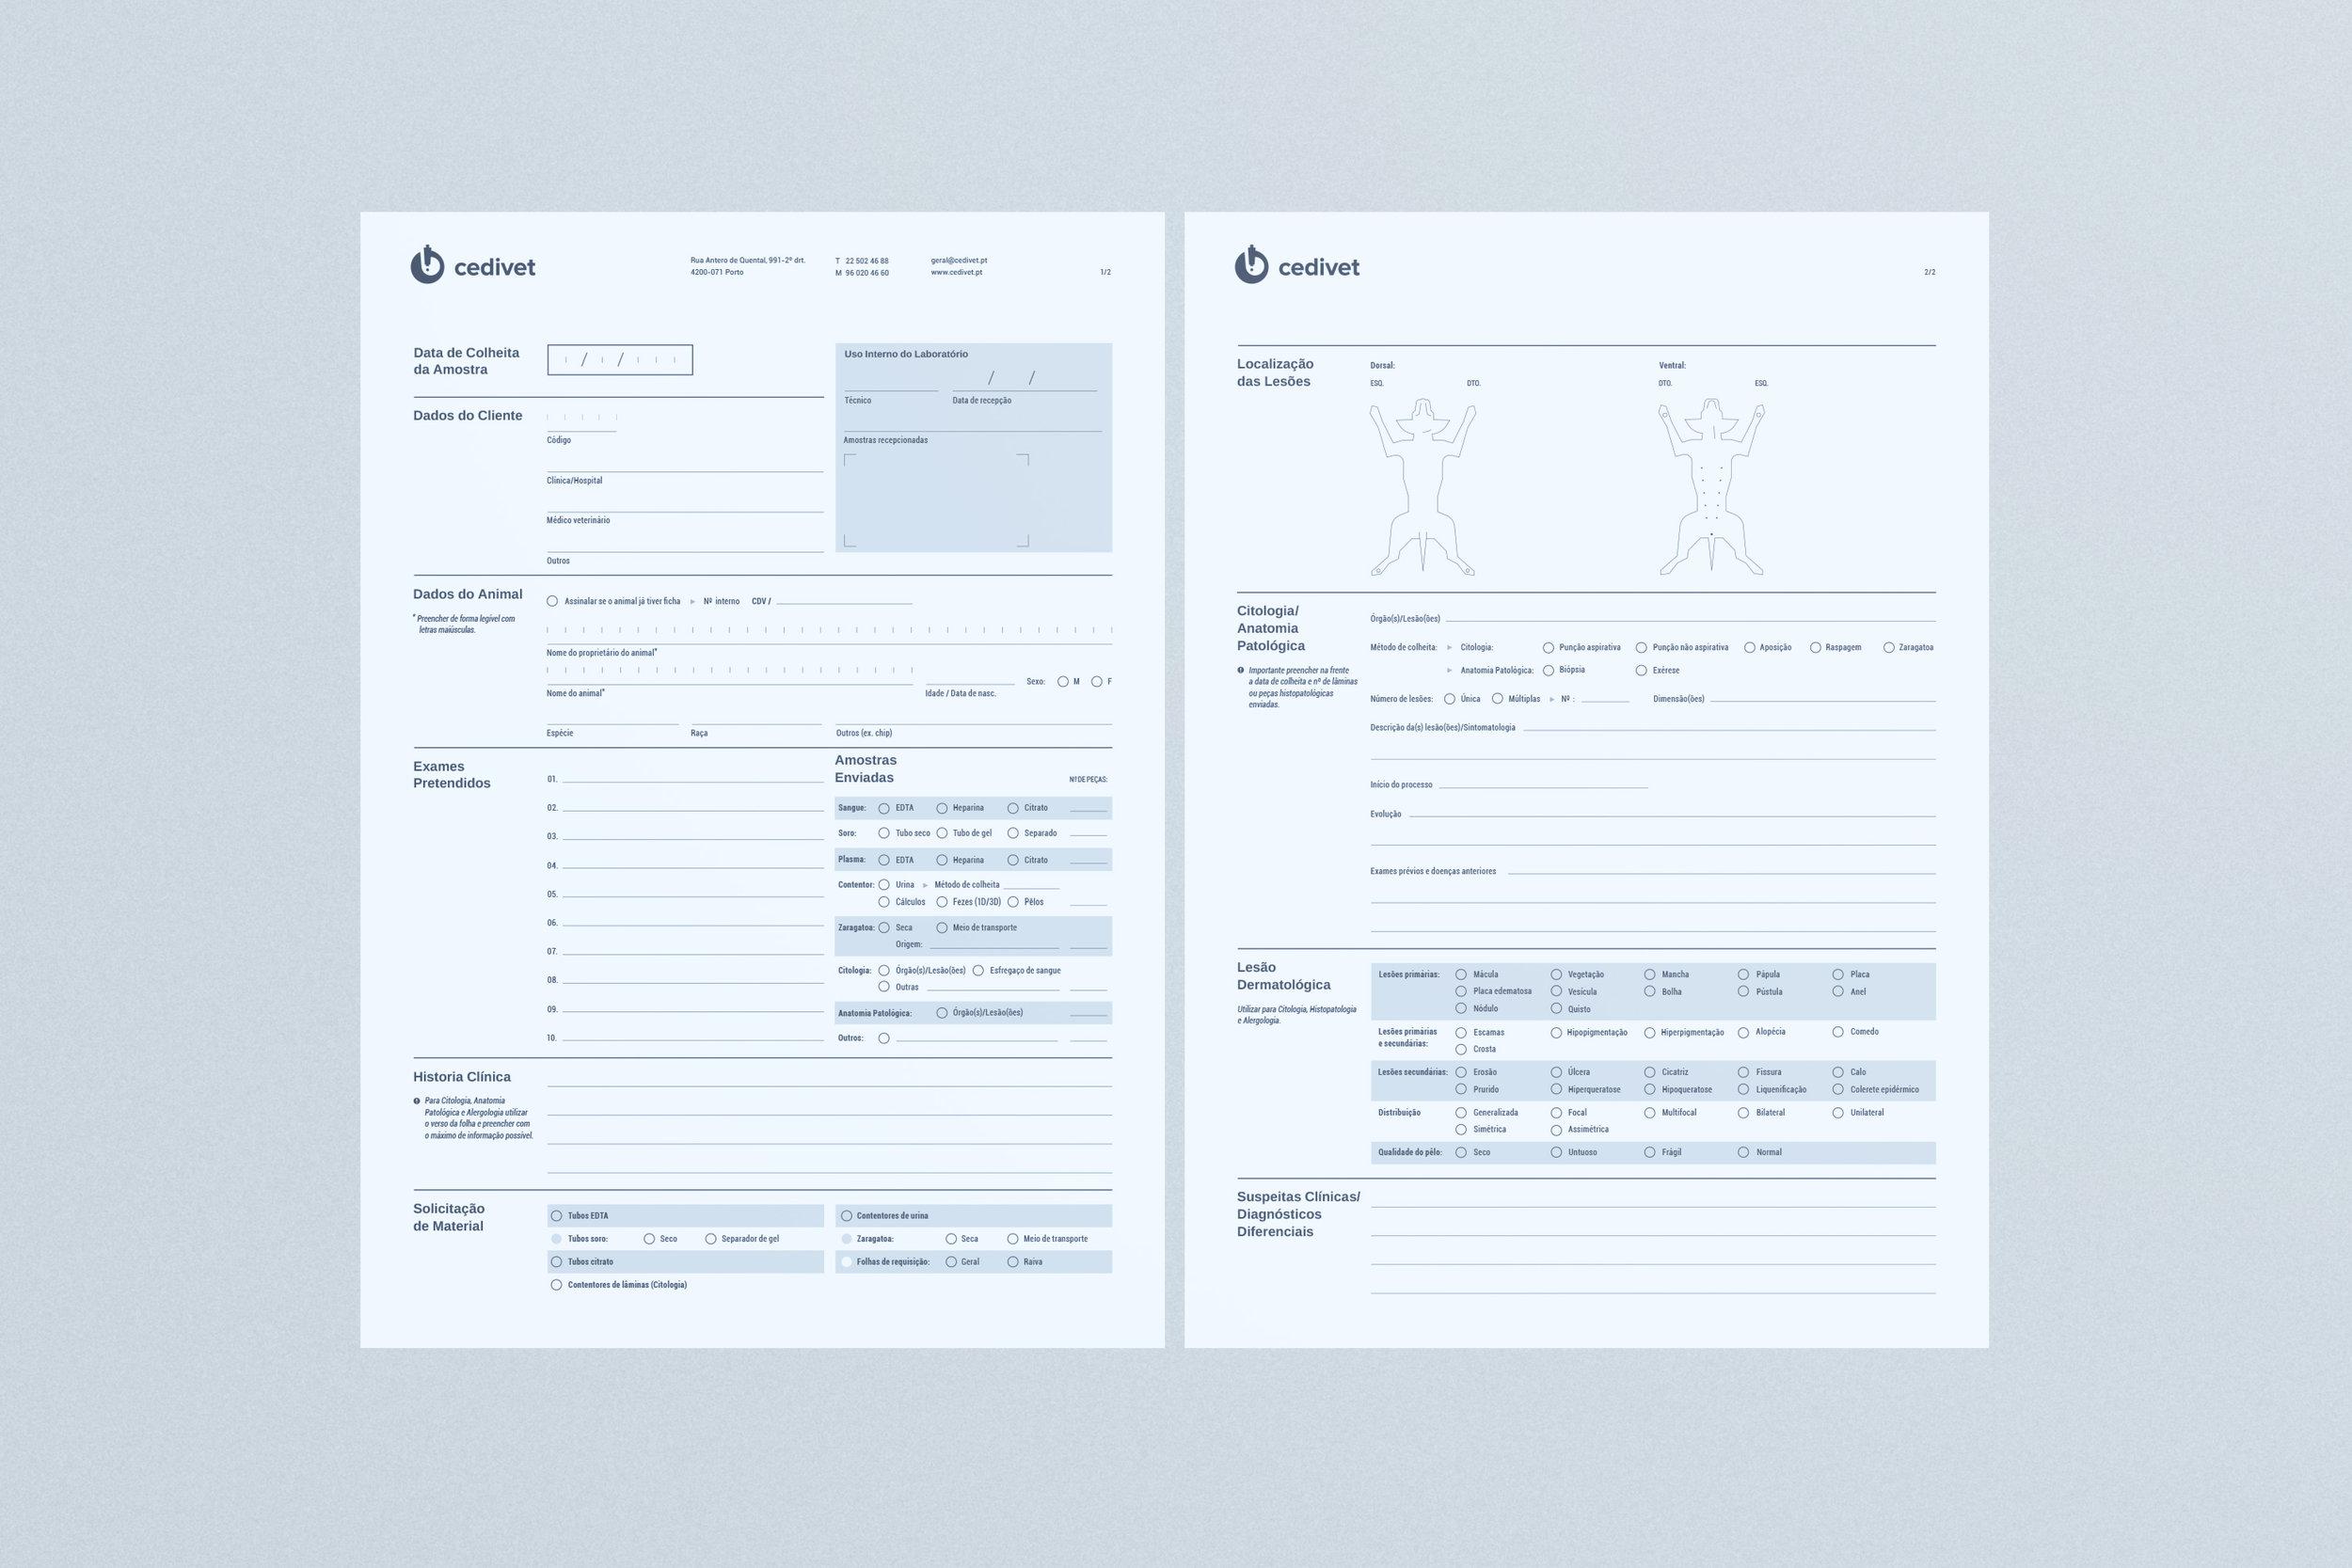 Cedivet+Veterinary+Lab+identity+by+Gen+design+studio-2.jpg